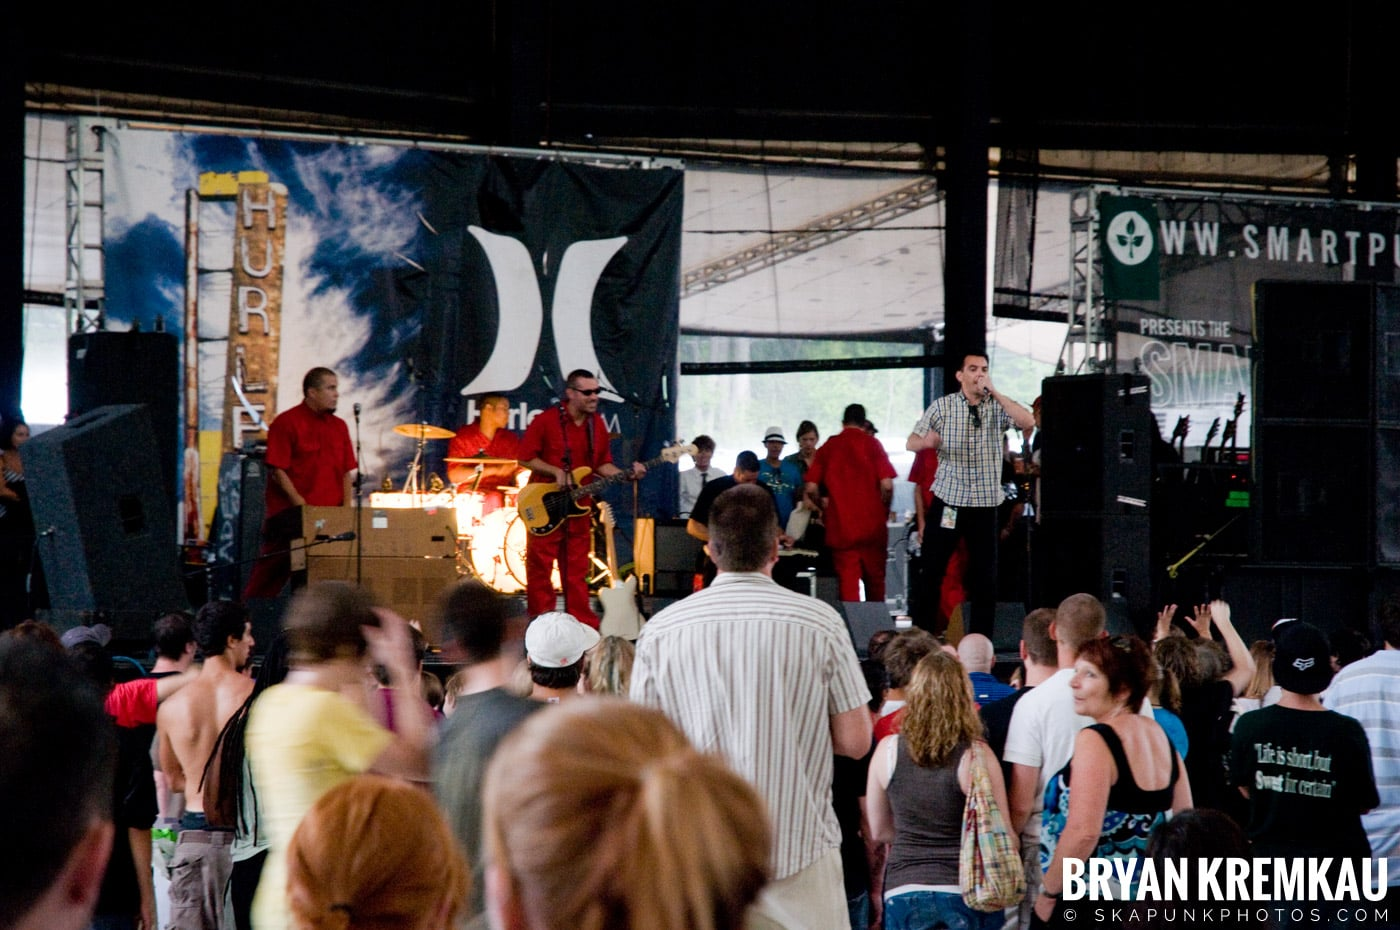 The Aggrolites @ Warped Tour 08, Scranton PA - 7.27.08 (1)